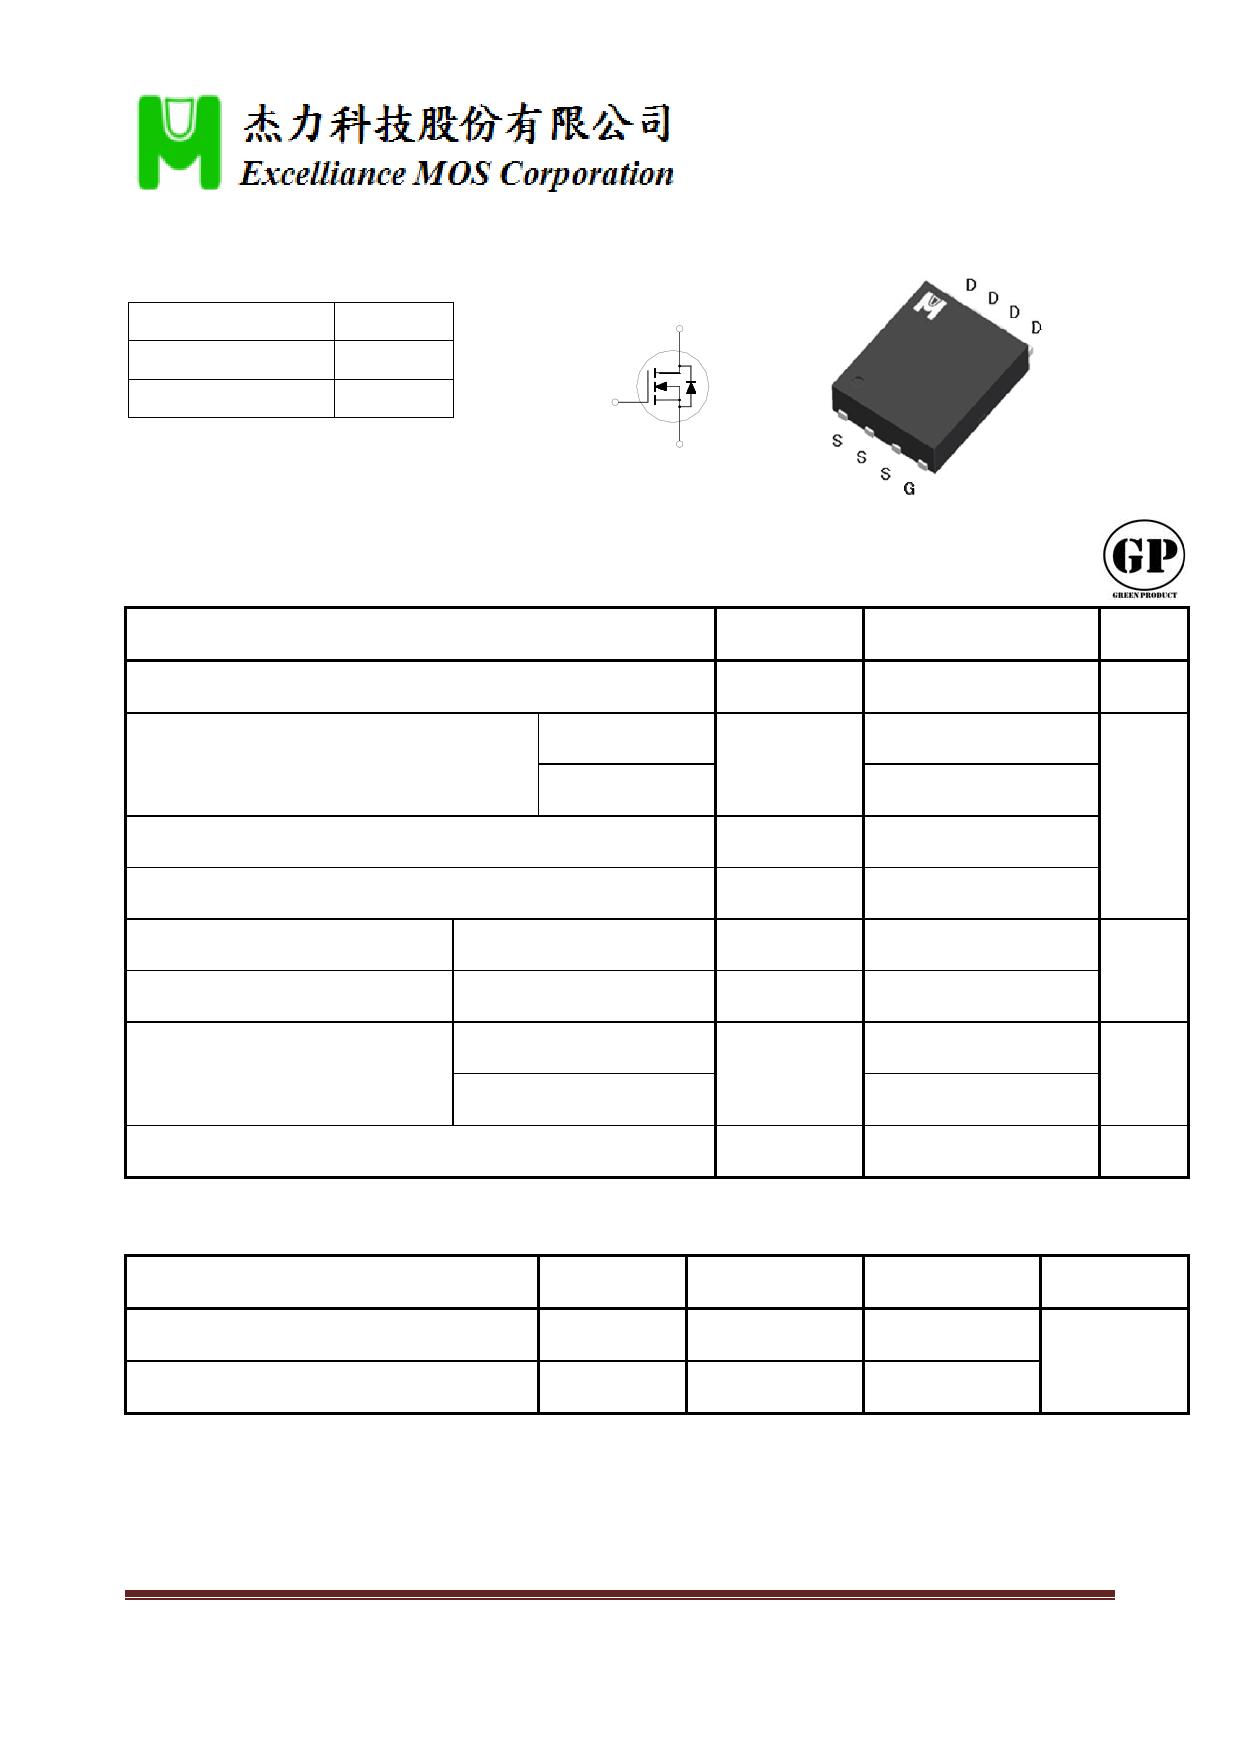 EMB16N06H دیتاشیت PDF